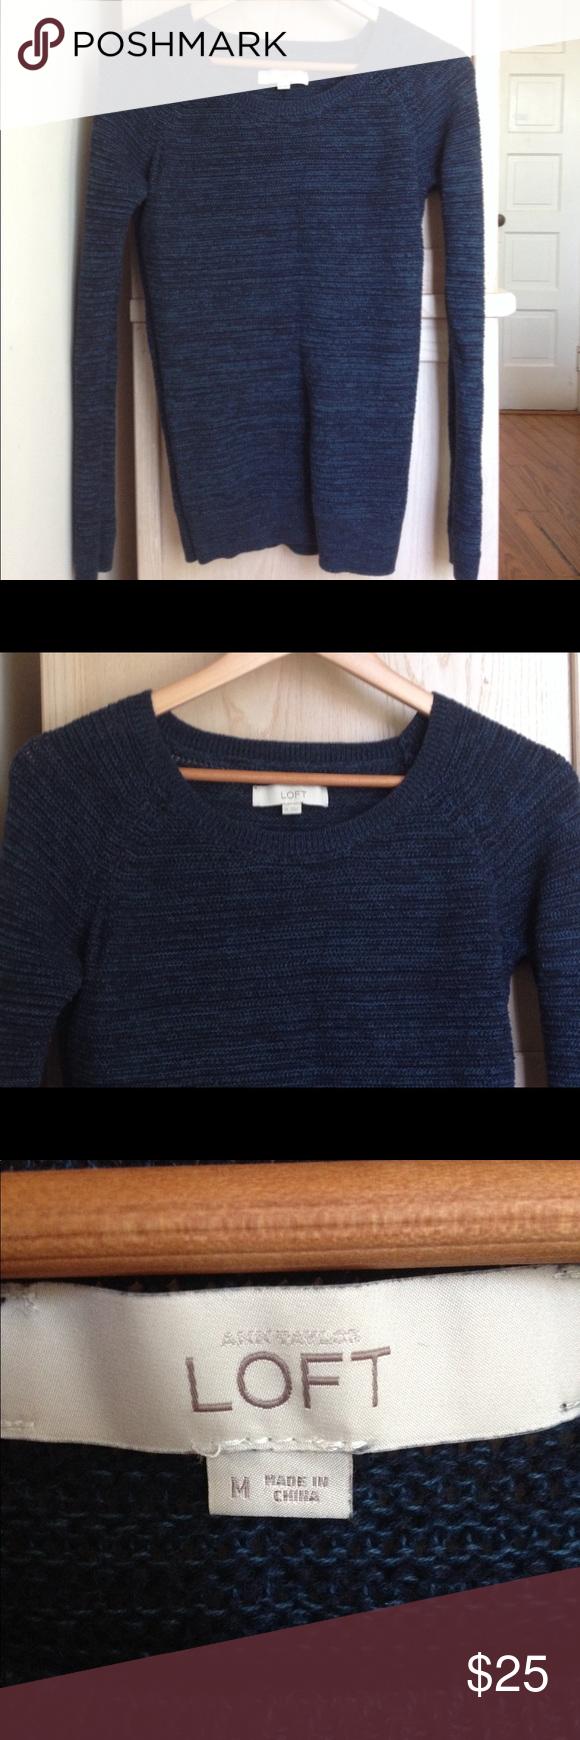 LOFT deep royal blue boyfriend sweater | Scoop neck, Royal blue ...